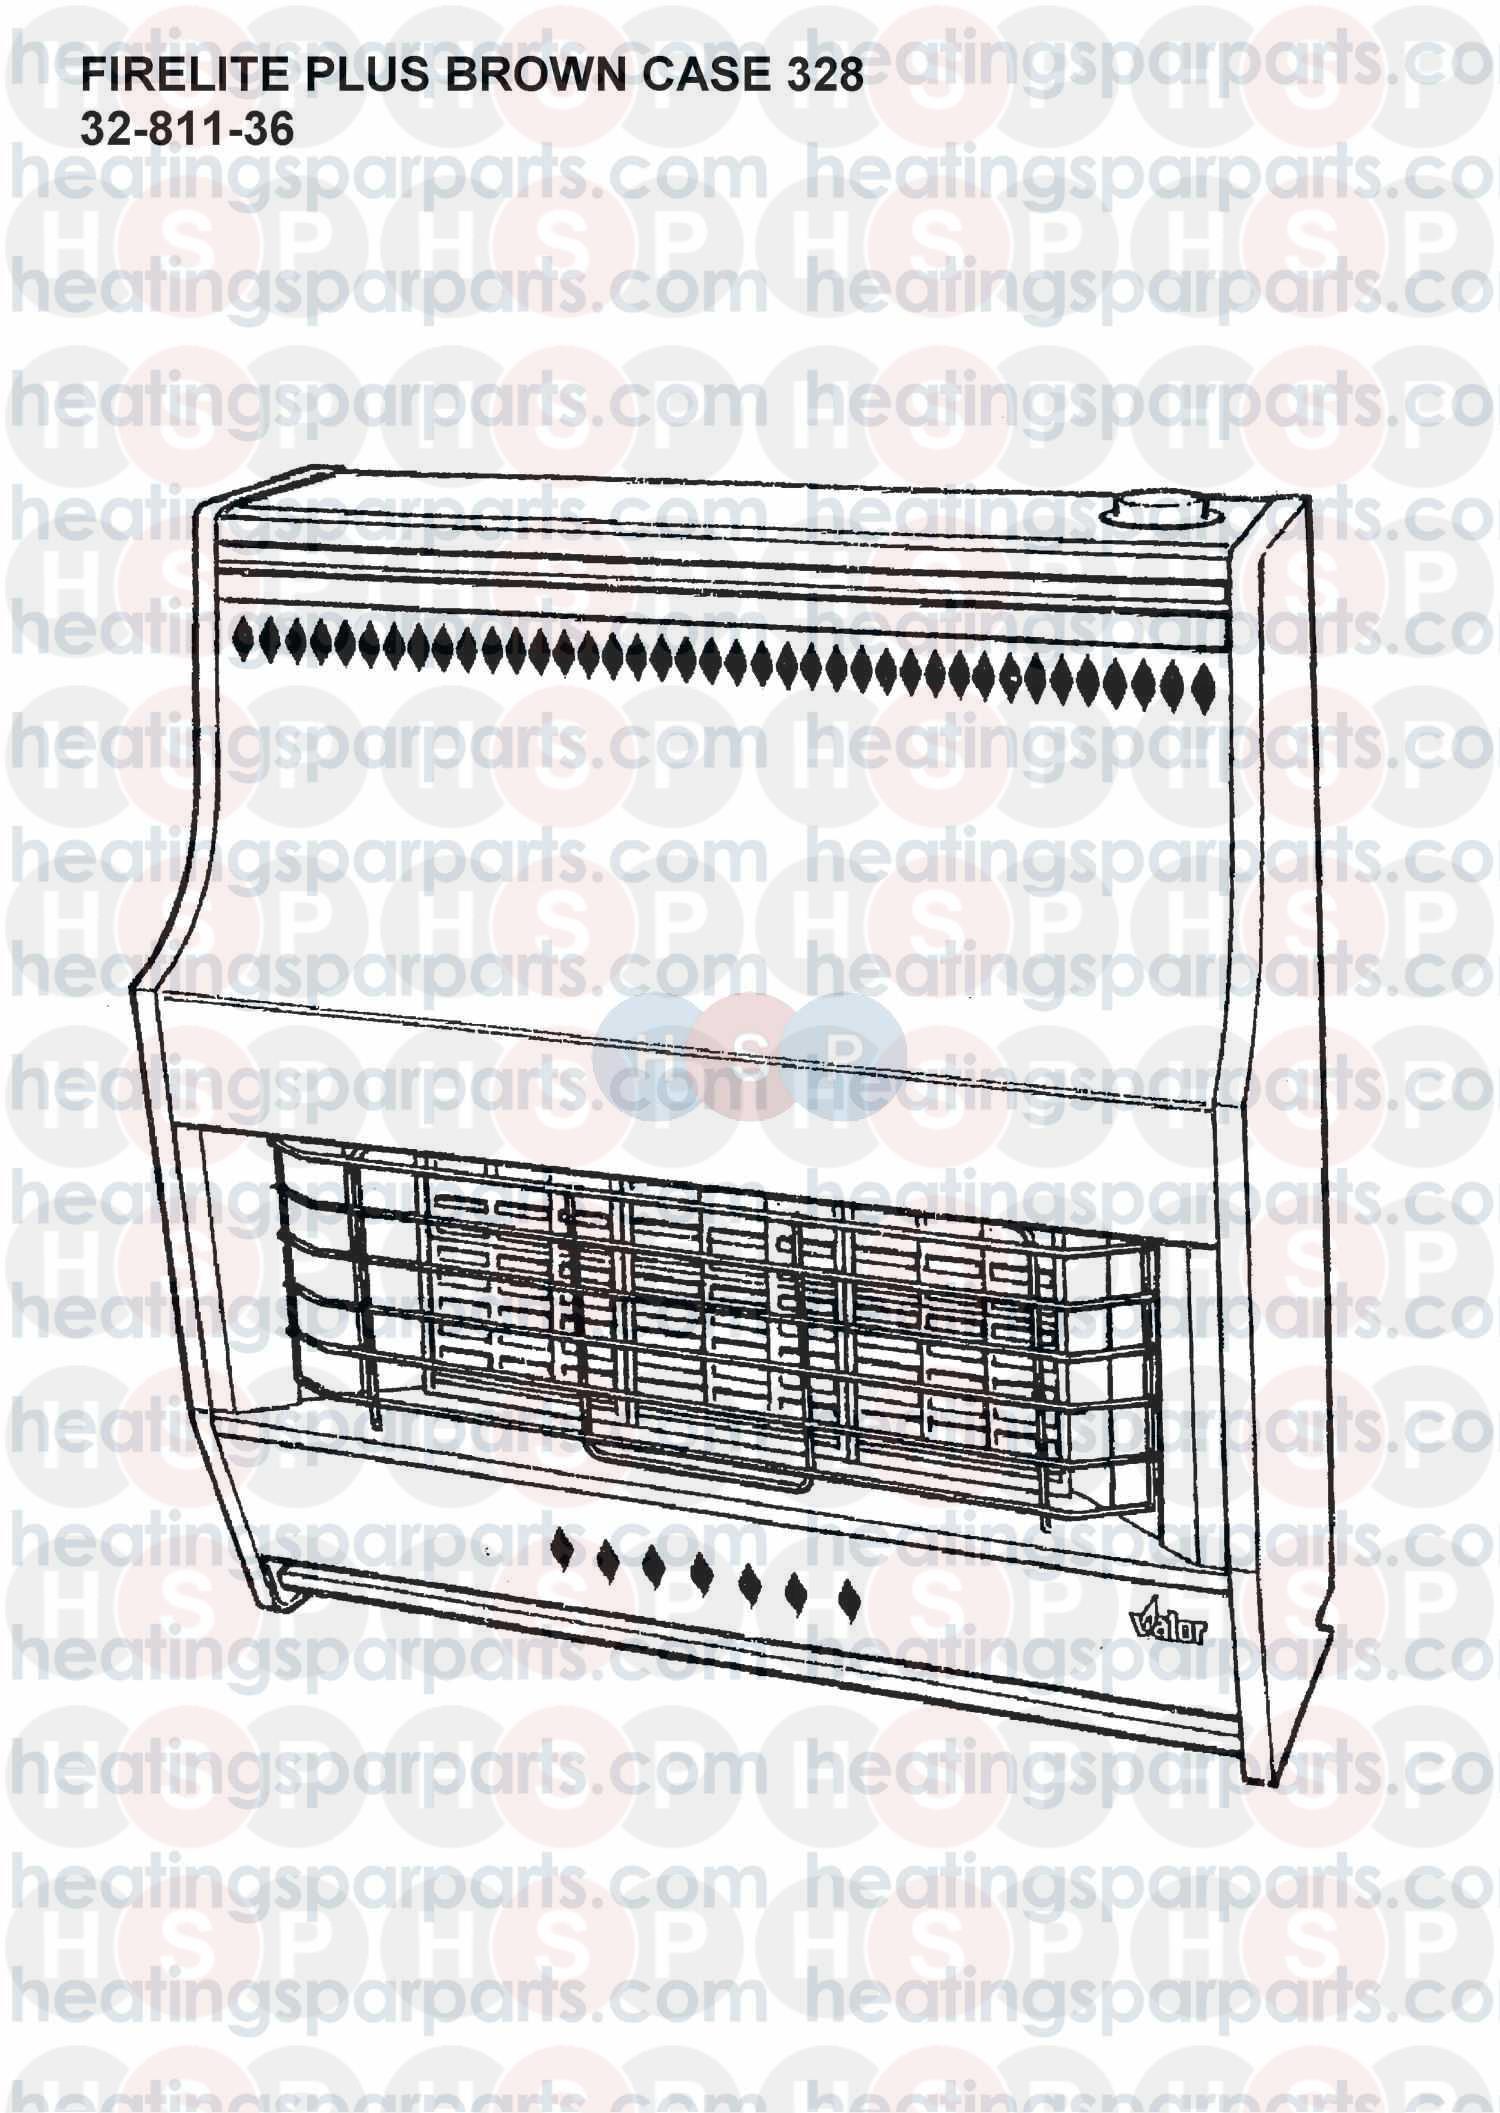 Valor Gas fire FIRELITE PLUS (BROWN CASE) MODEL NO.328